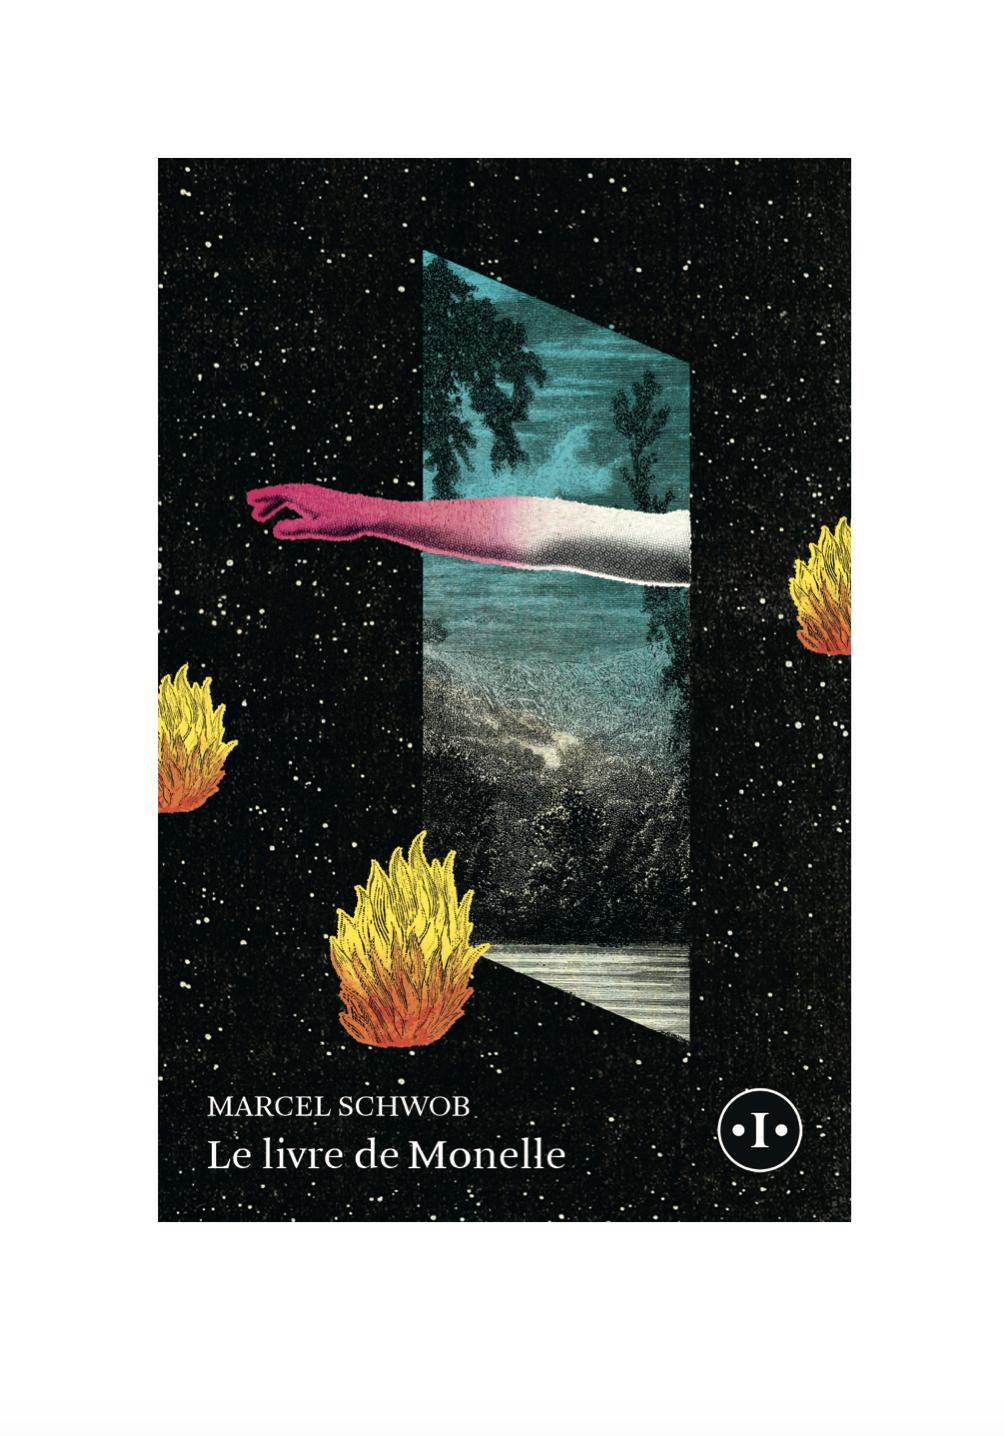 CHLOÉ POIZAT | GALERIE TREIZE-DIX I | CHLOÉ POIZAT - L'ICONOGRAPHE